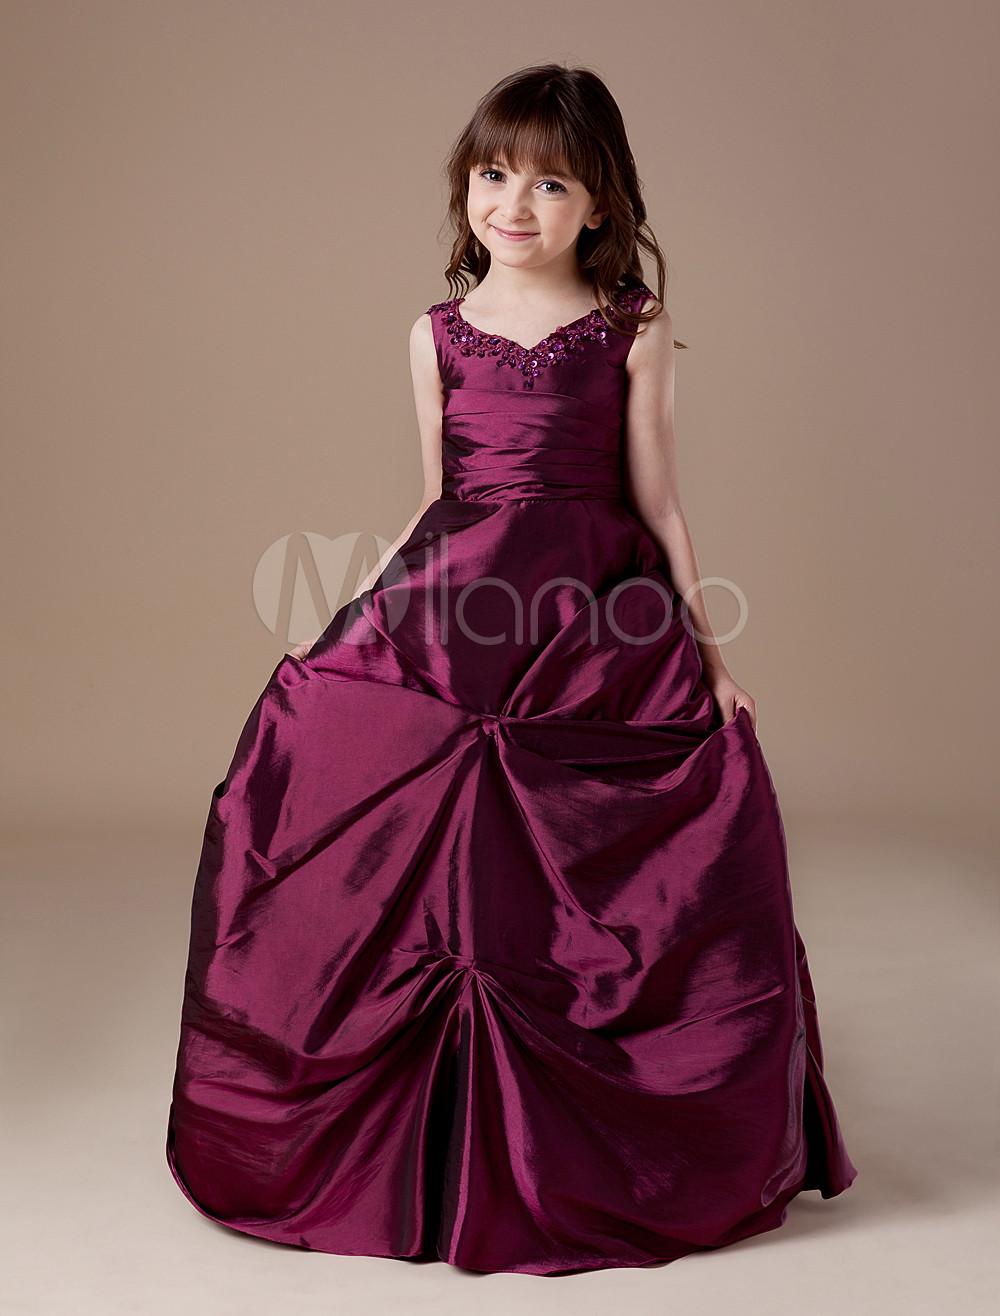 Flower Girl Dress Taffeta Ball Gown Burgundy Ruched Beading Kids Pageant Dress V Neck Floor Length First Communion Dress